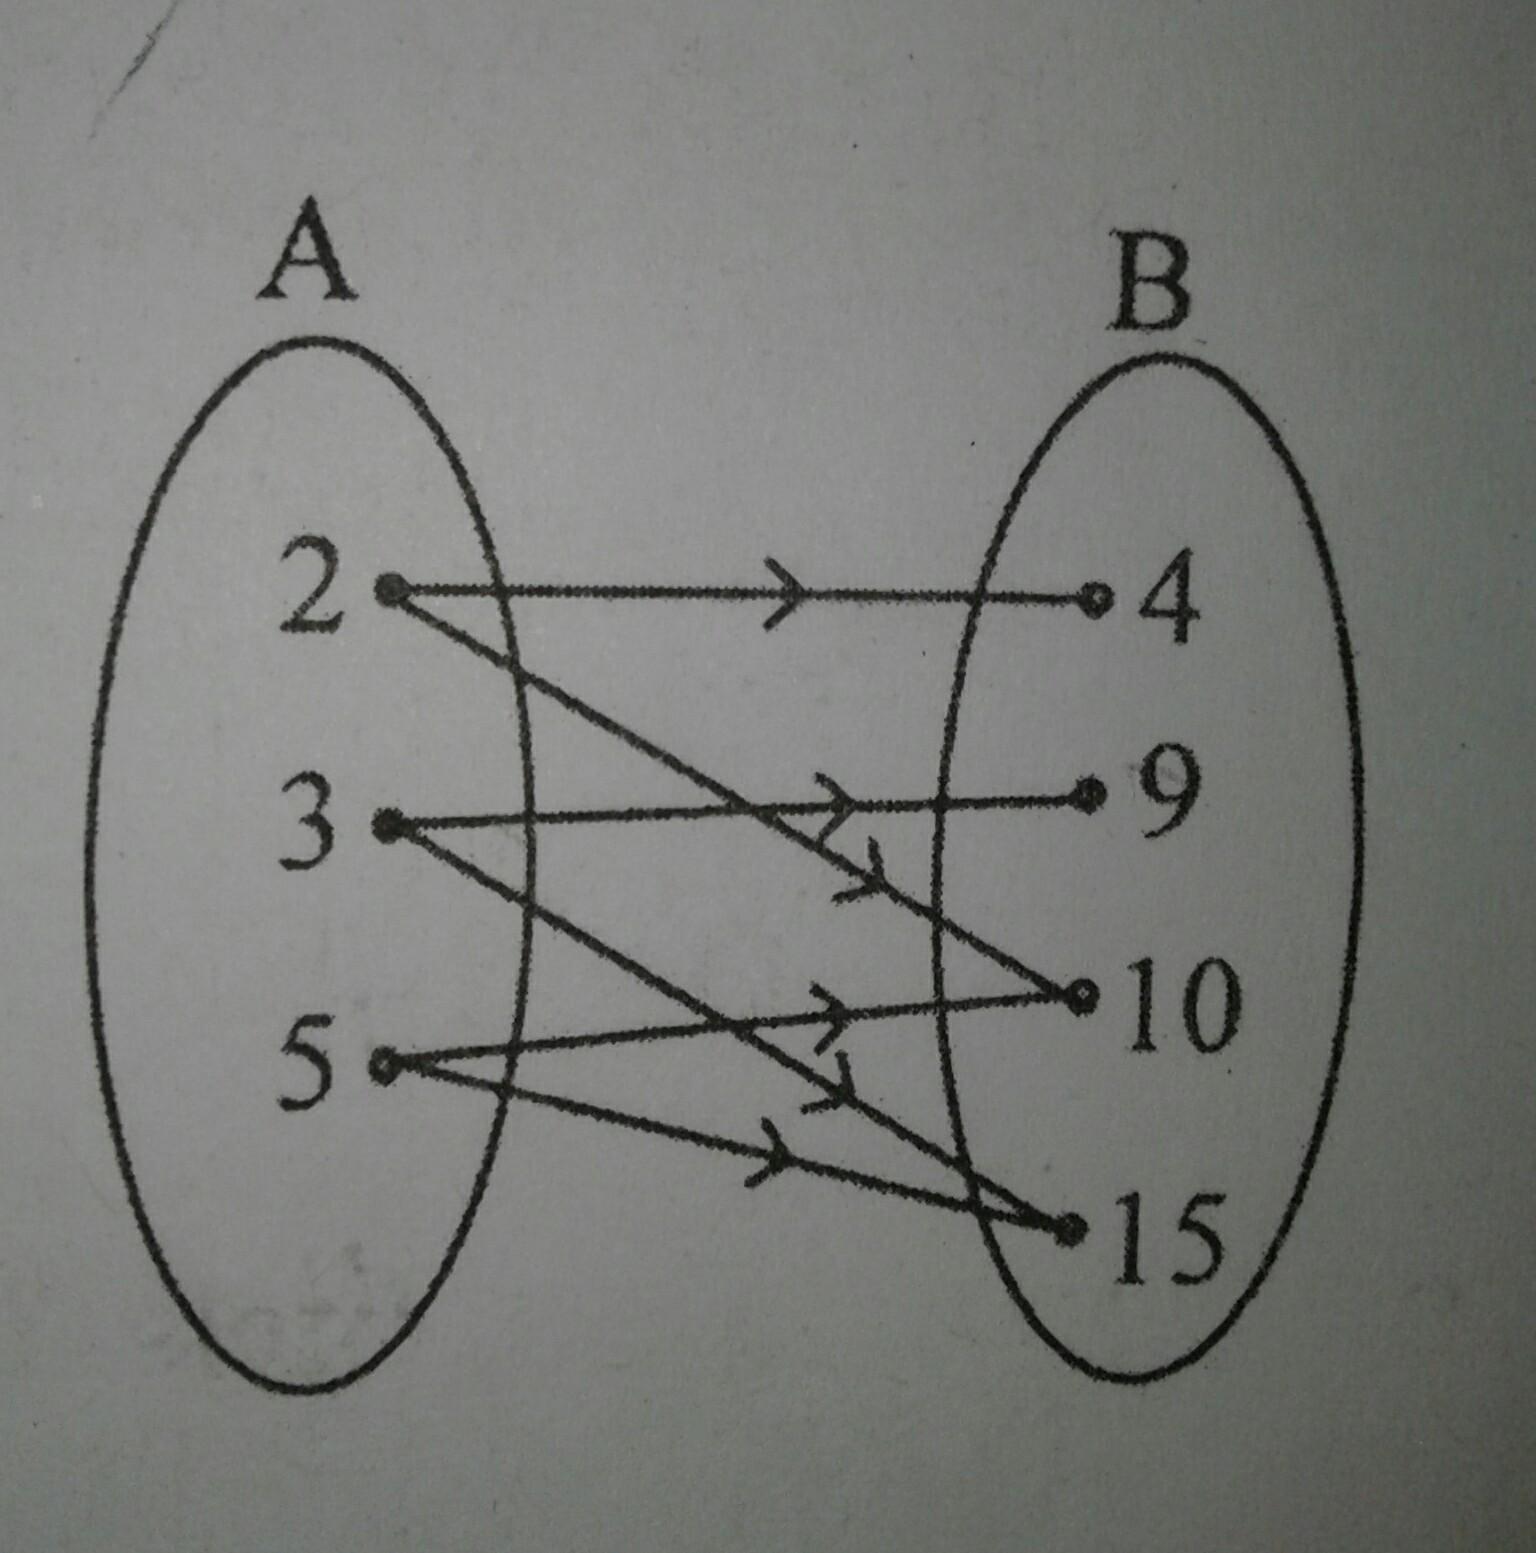 Relasi dari himpunan a ke himpunan b pada diagram panah disamping unduh jpg ccuart Images